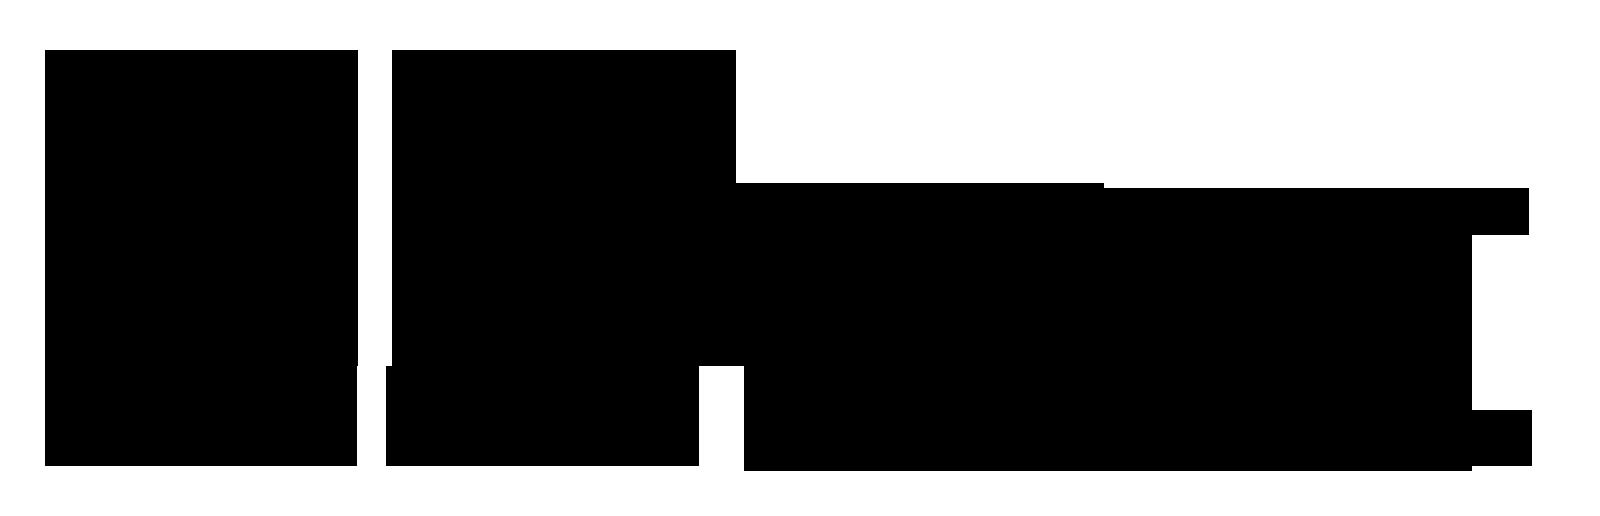 Linux логотип PNG